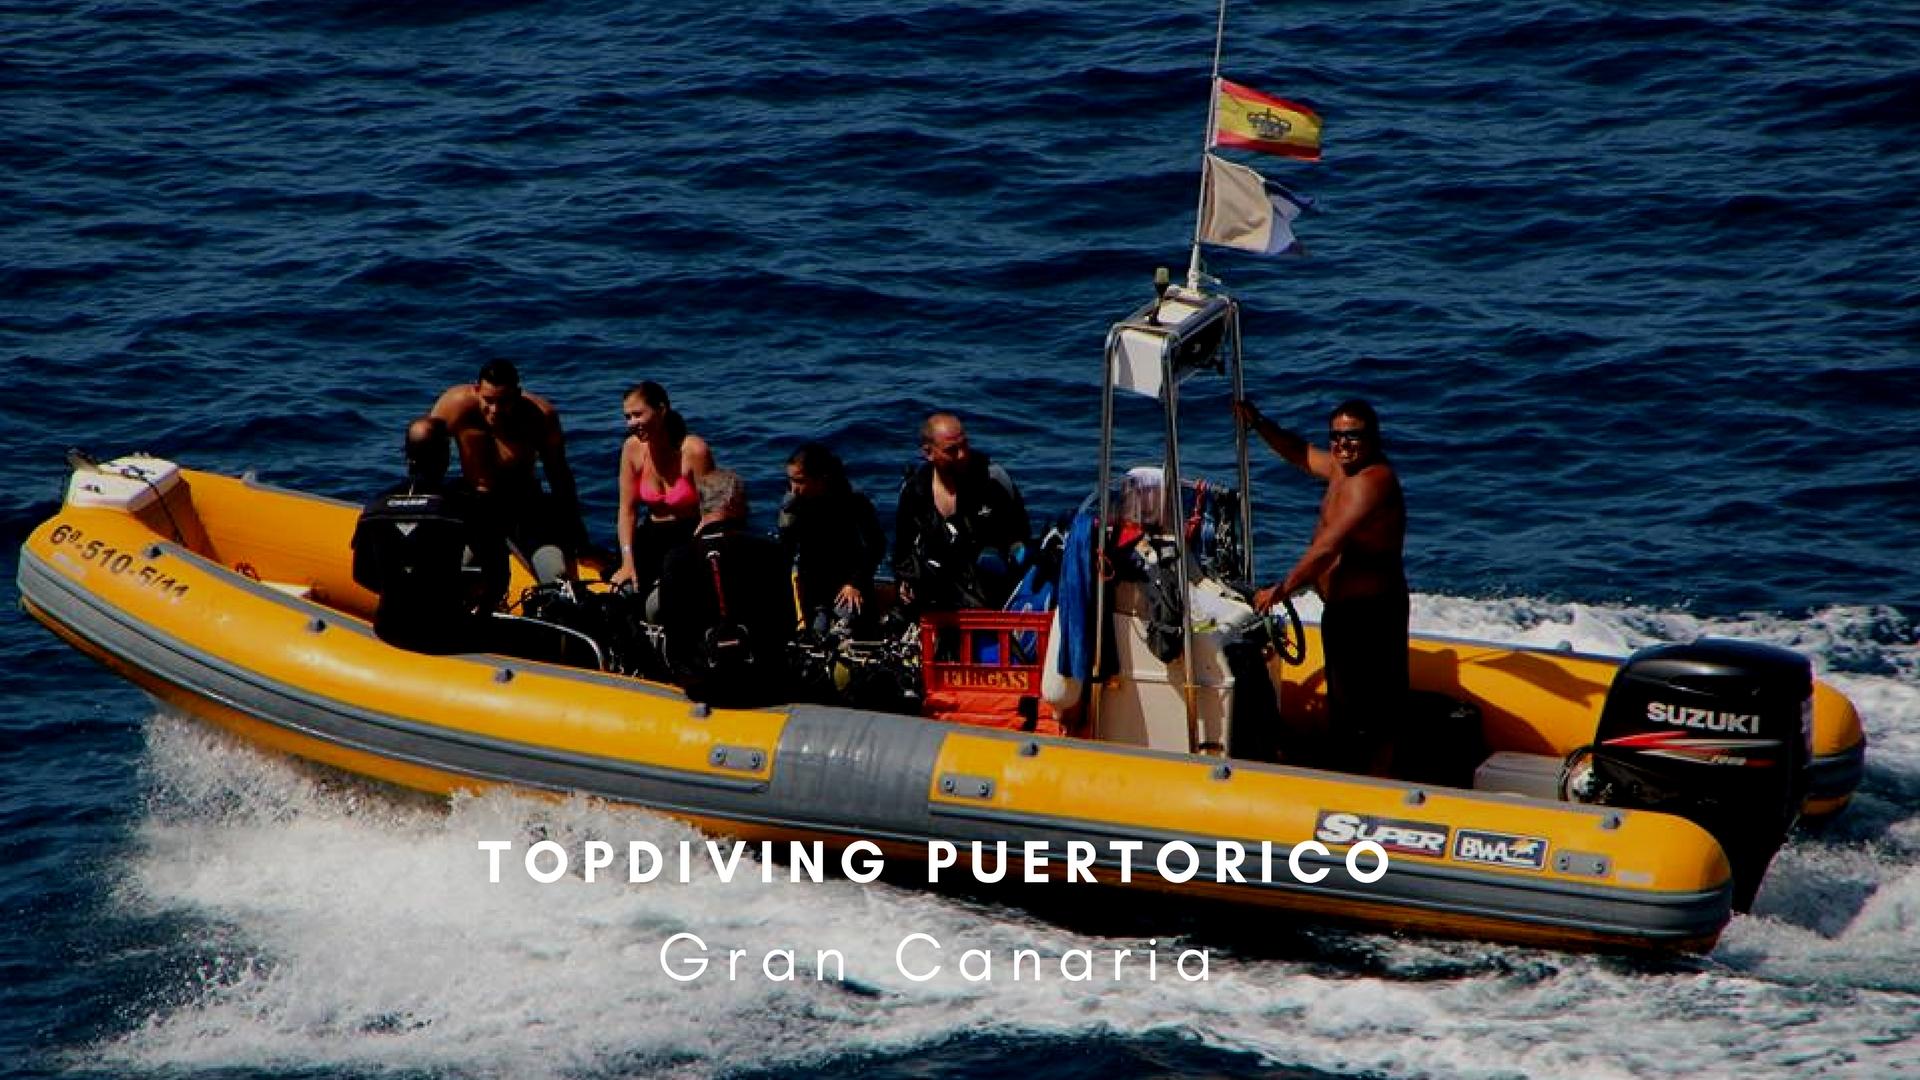 Top Diving Puerto Rico